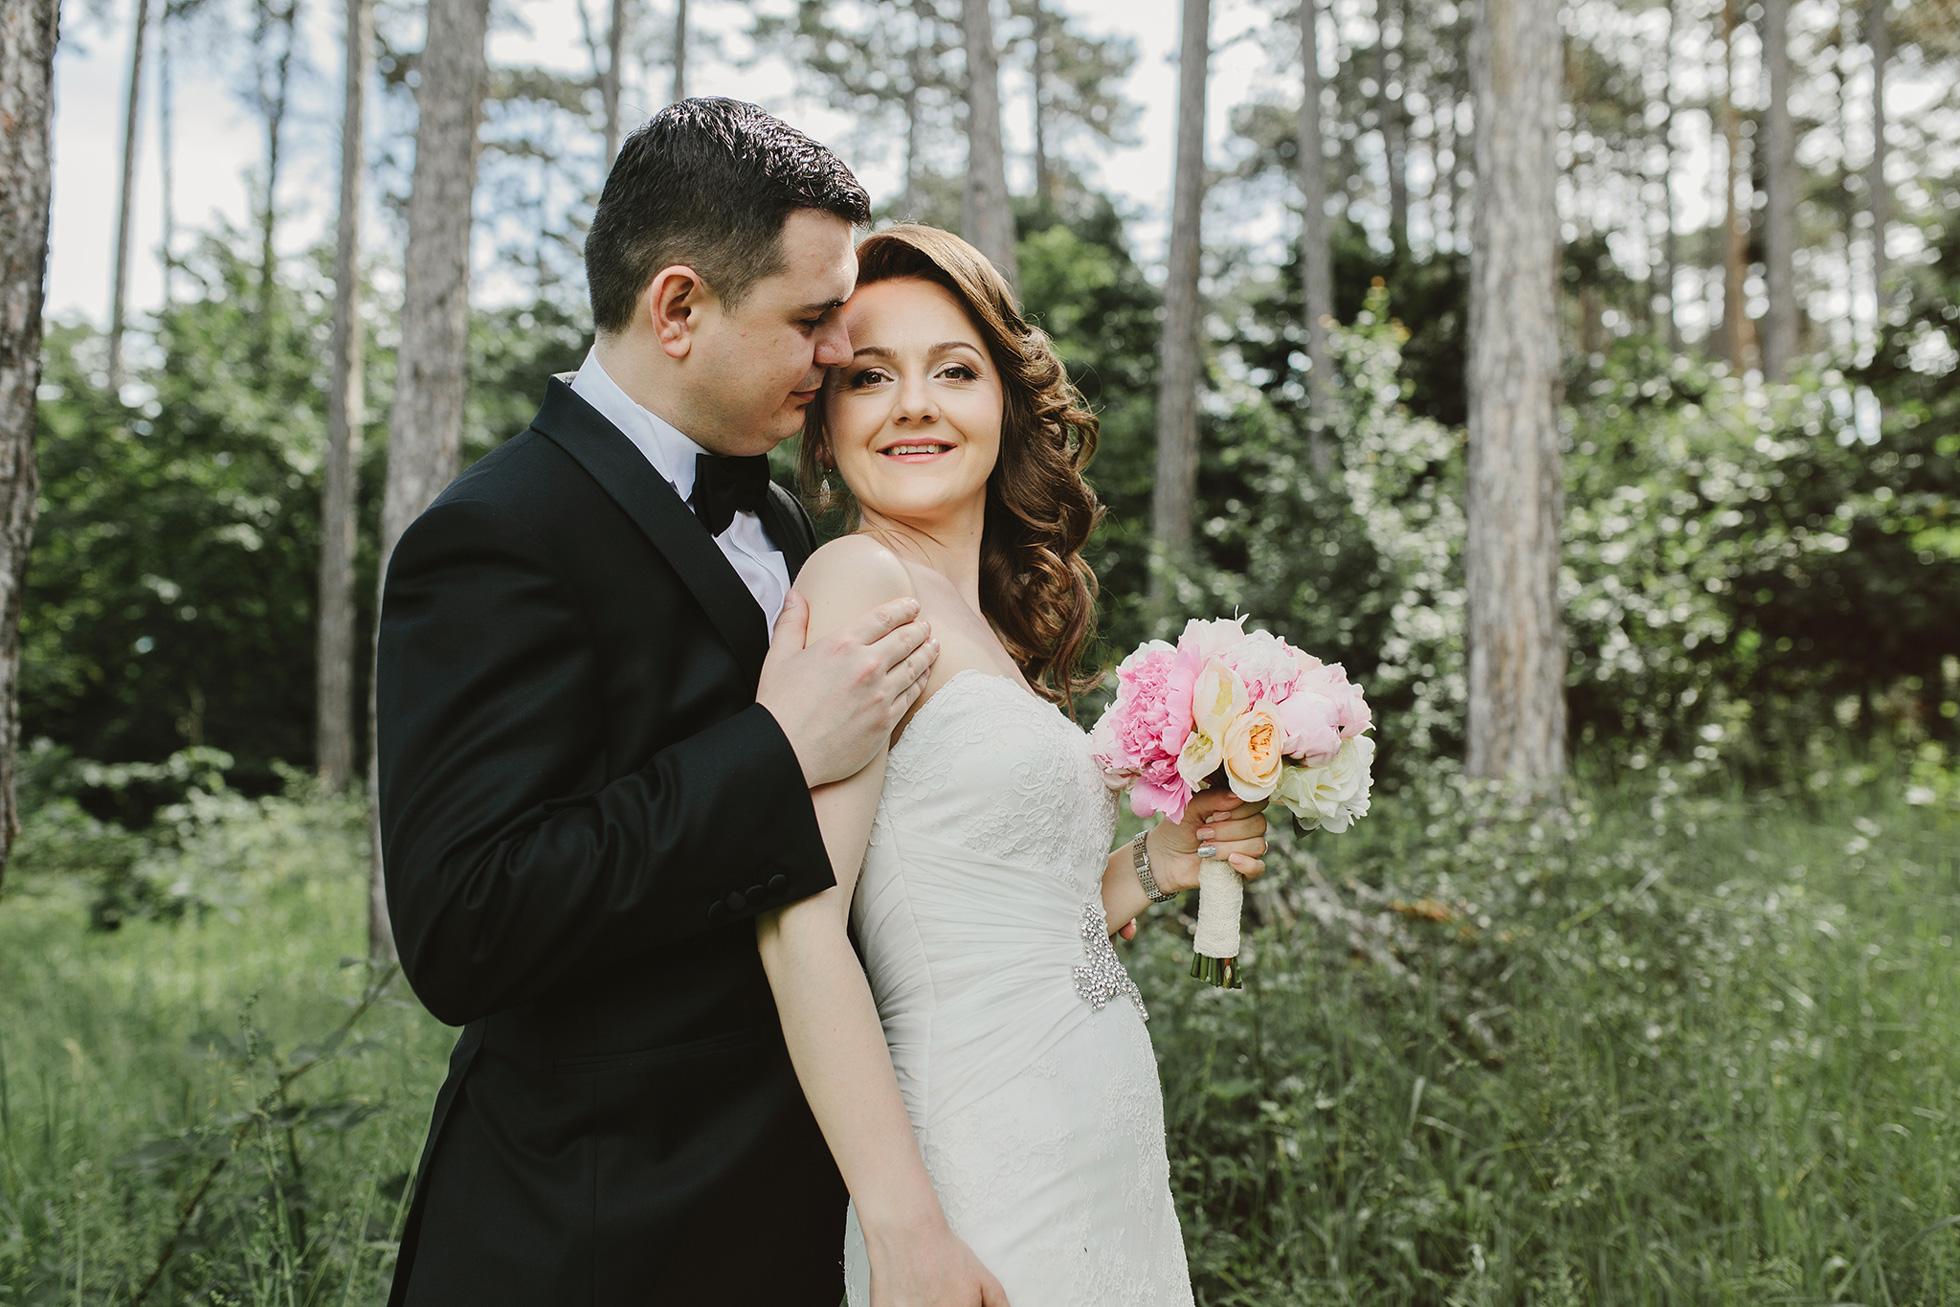 Liana-+-Florin-{wedding}-042